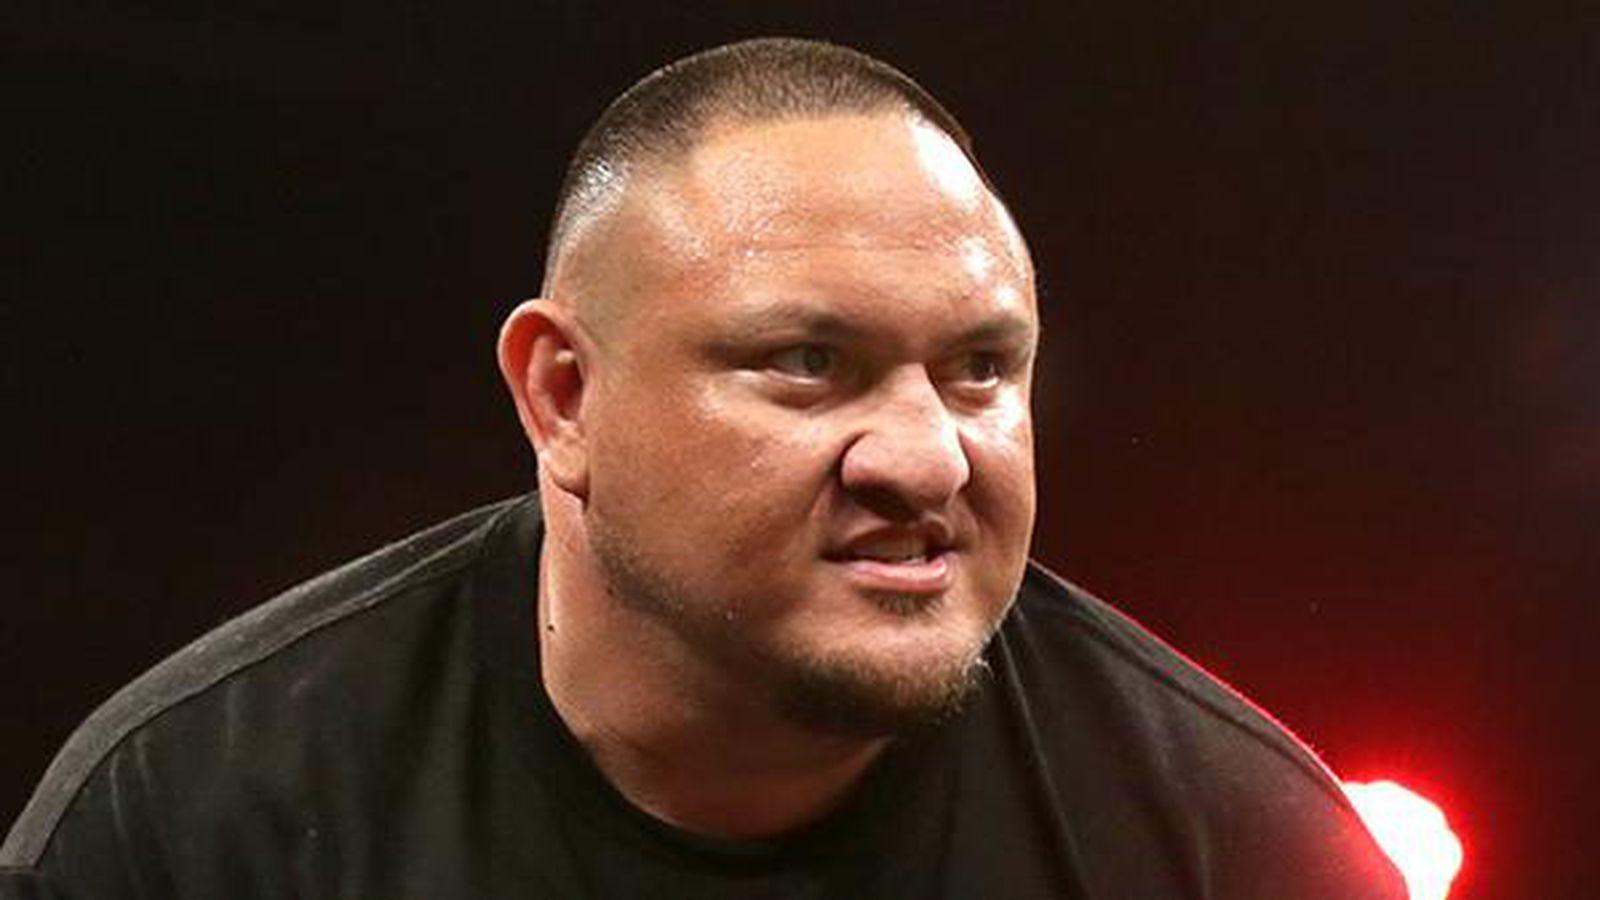 Rumor Roundup (June 9, 2015): John Cena injury, heat on Samoa Joe, WWE ...